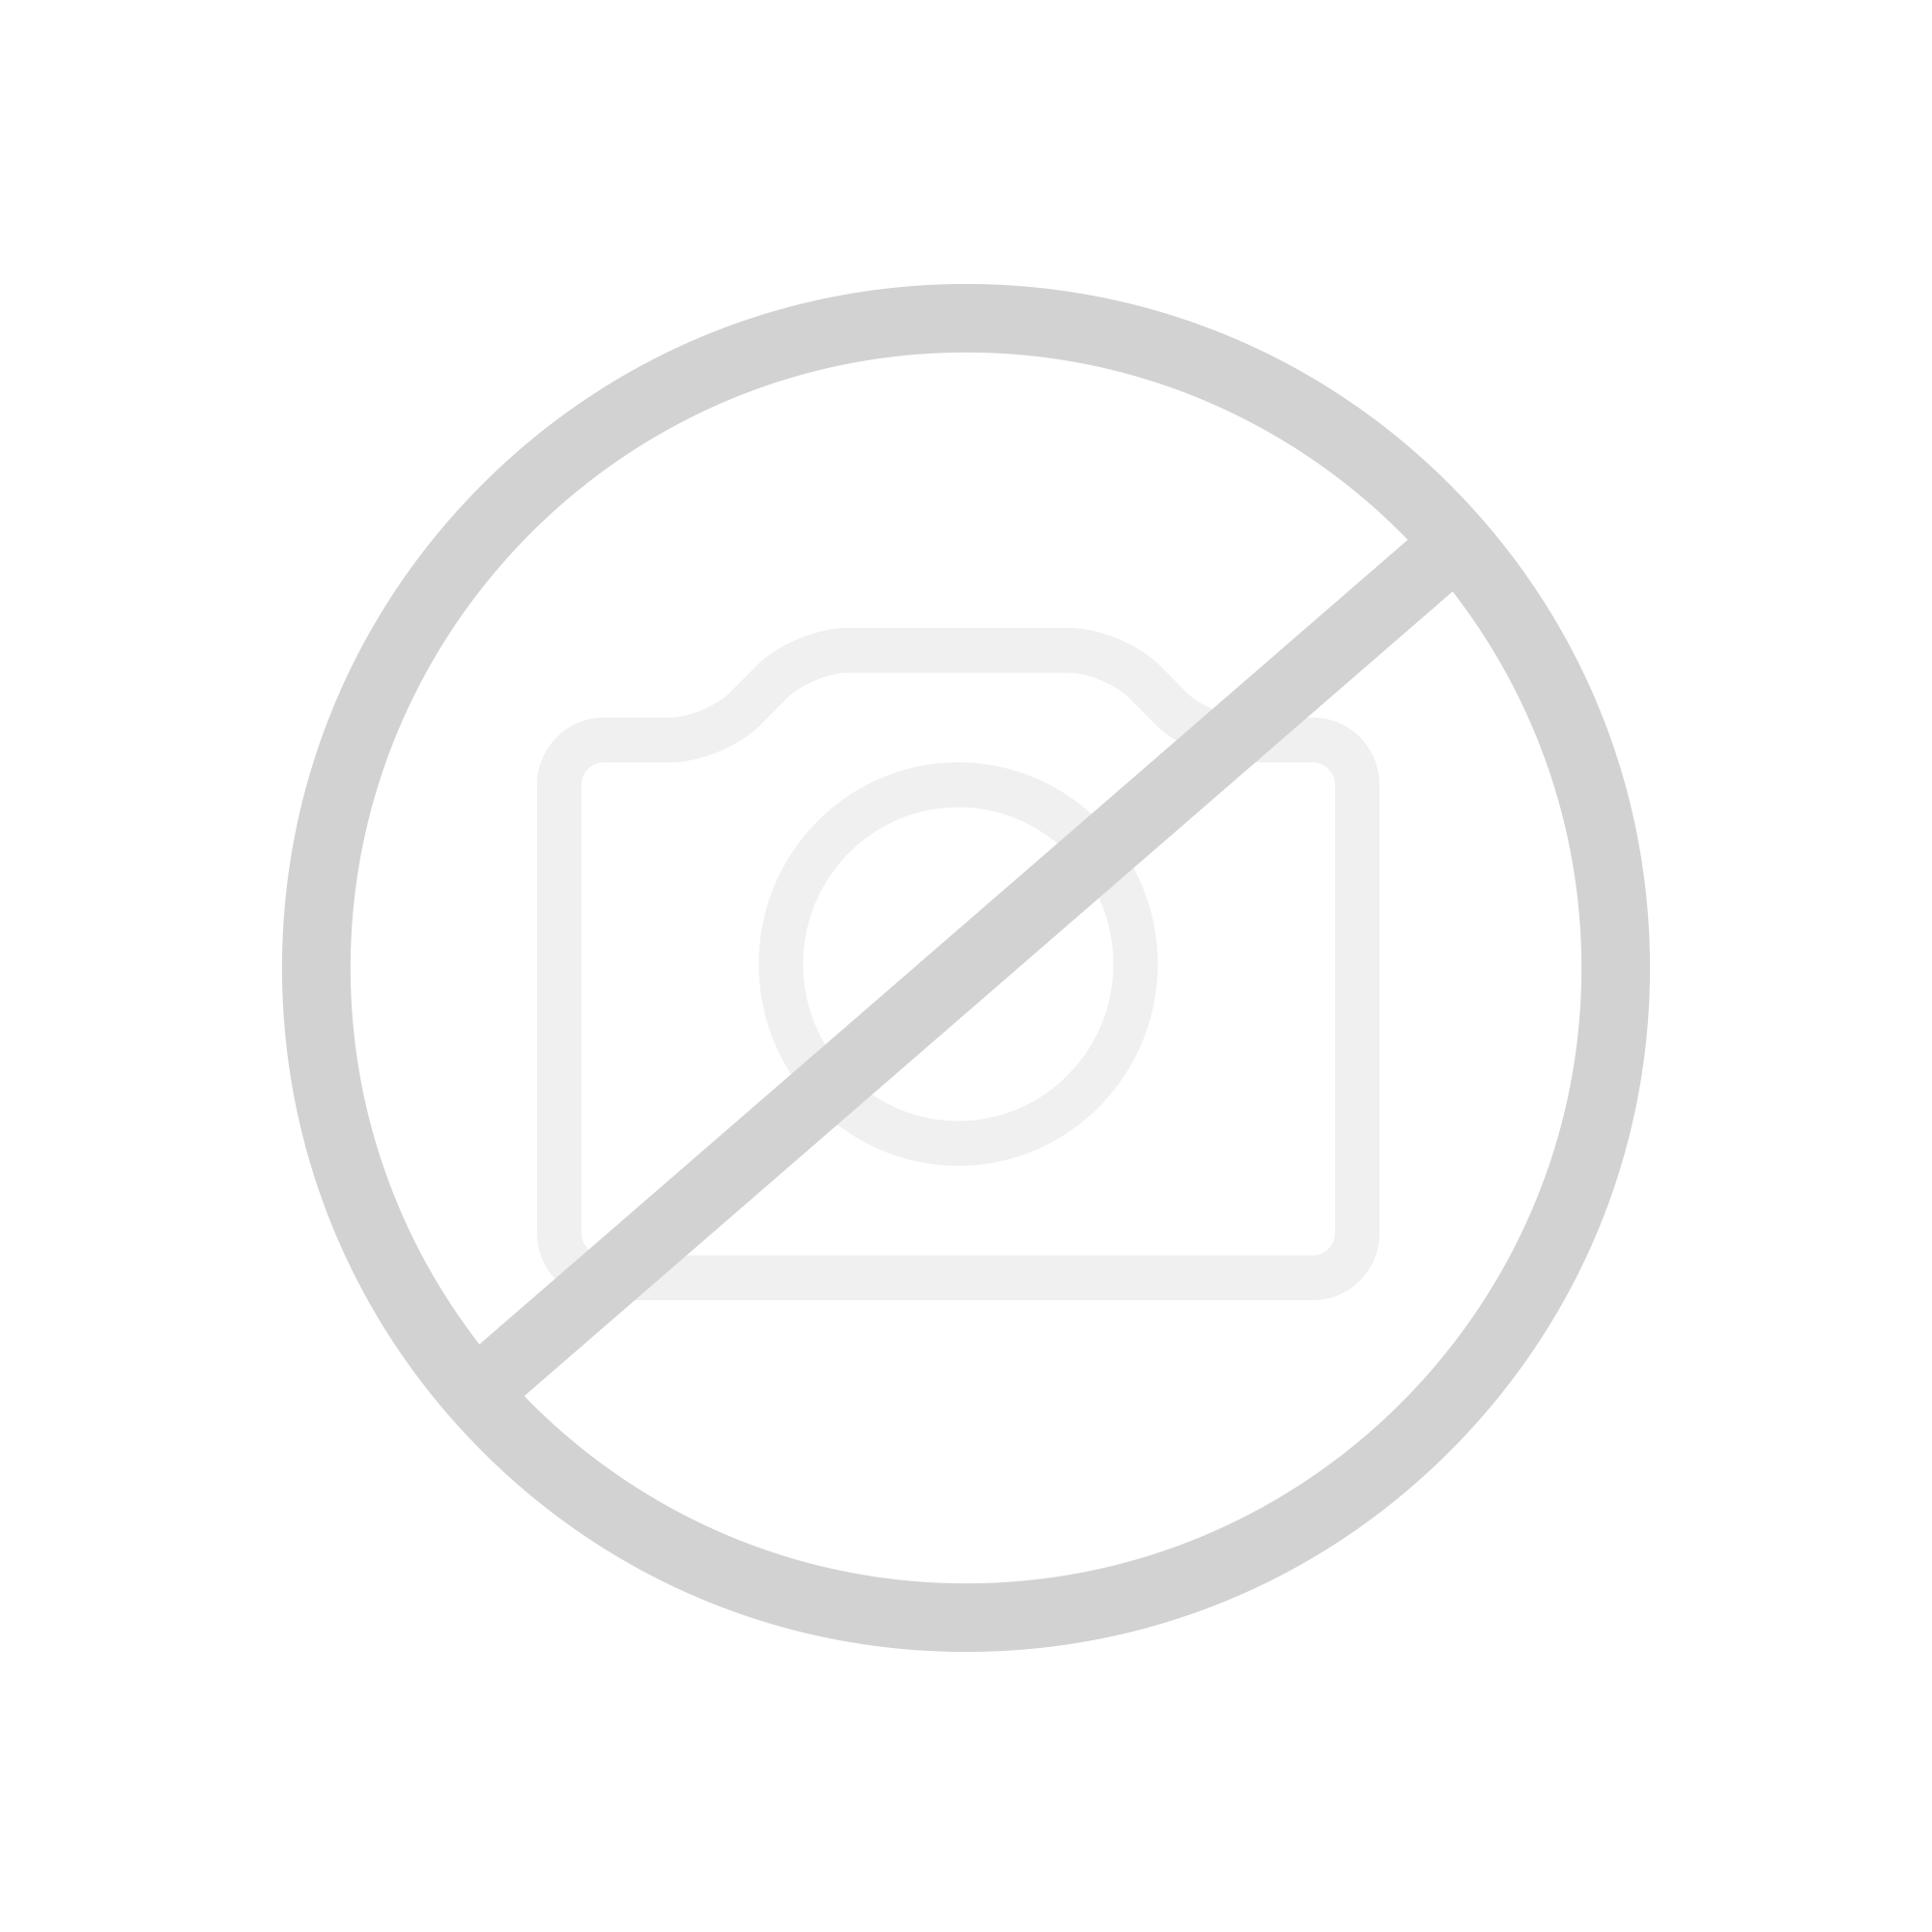 Dornbracht Tara Ultra Einhebelmischer Profi chrom